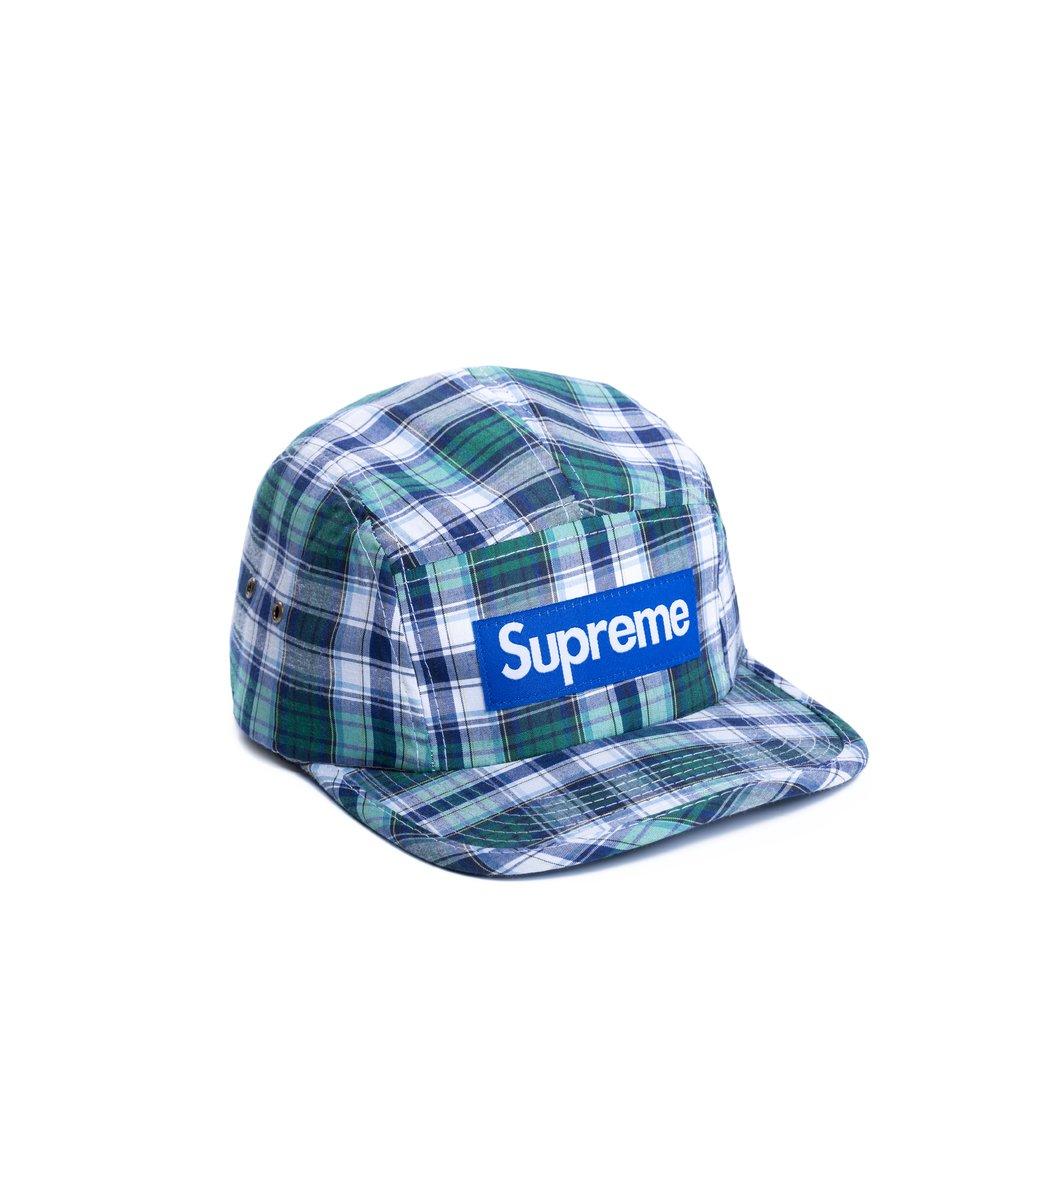 Кепка Supreme Cell (серо-зелёный/голубой) - Вид 1